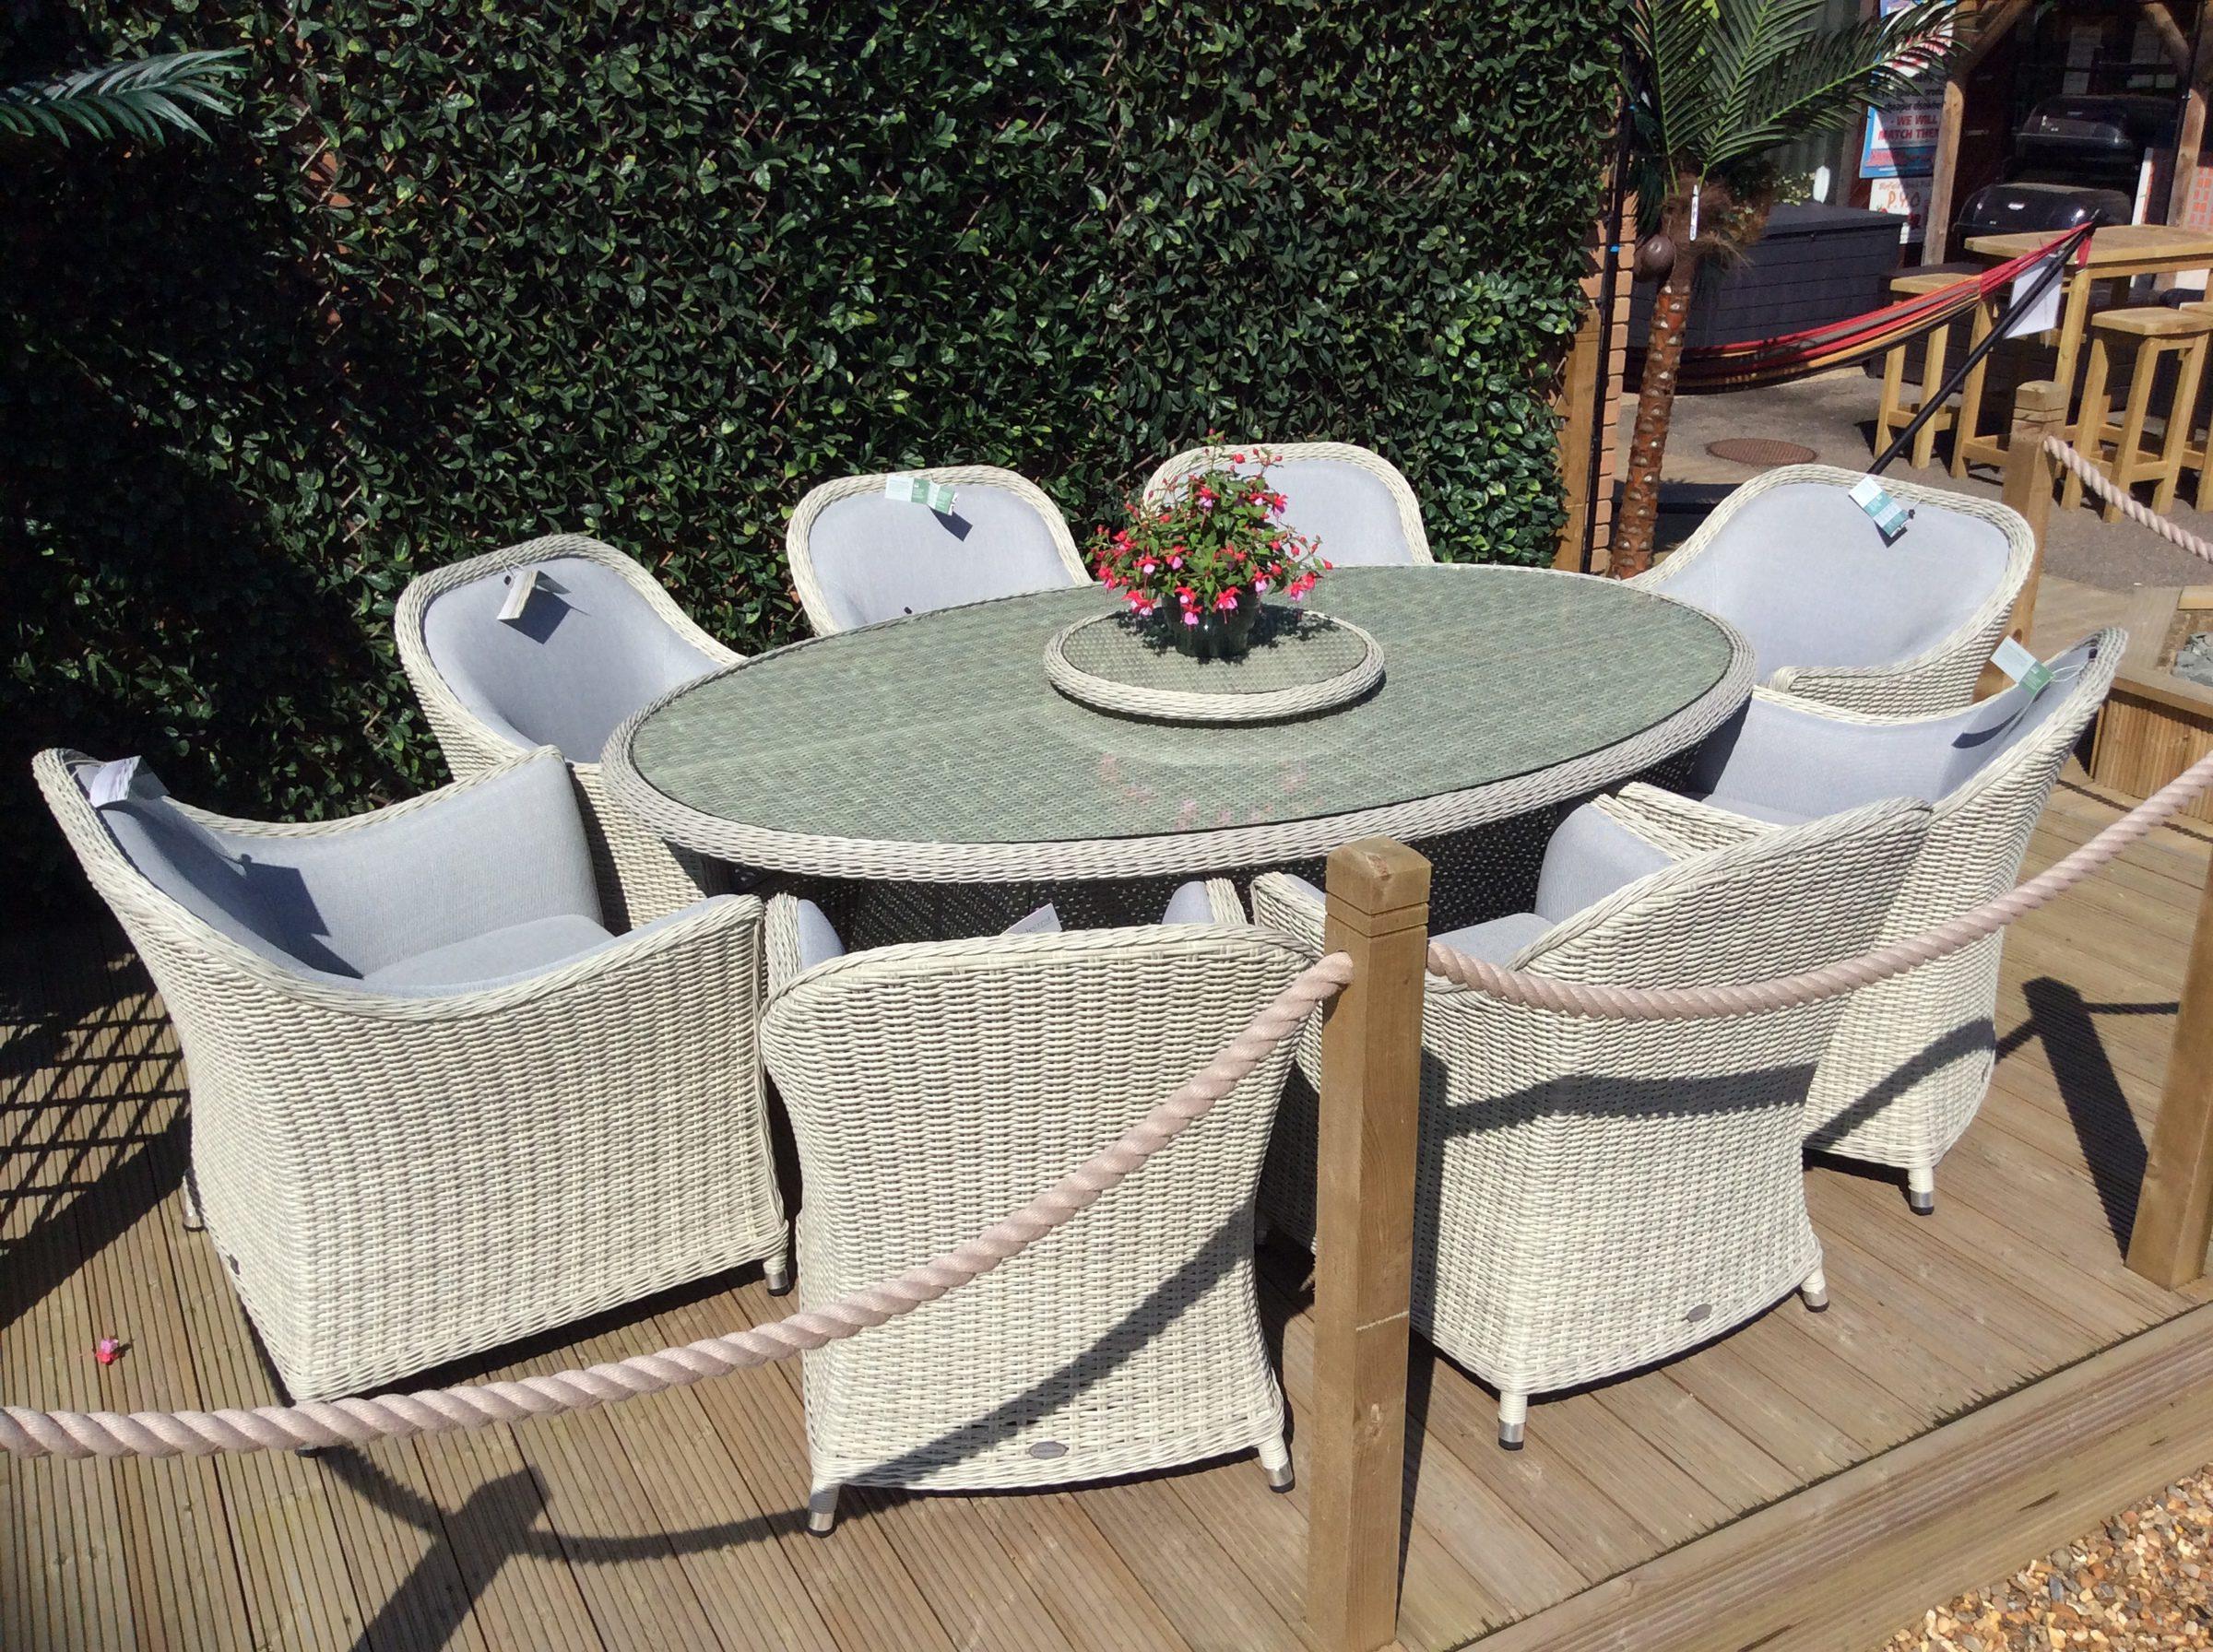 Bramblecrest Gainsborough 8-Seat Elliptical Dining Set 2018